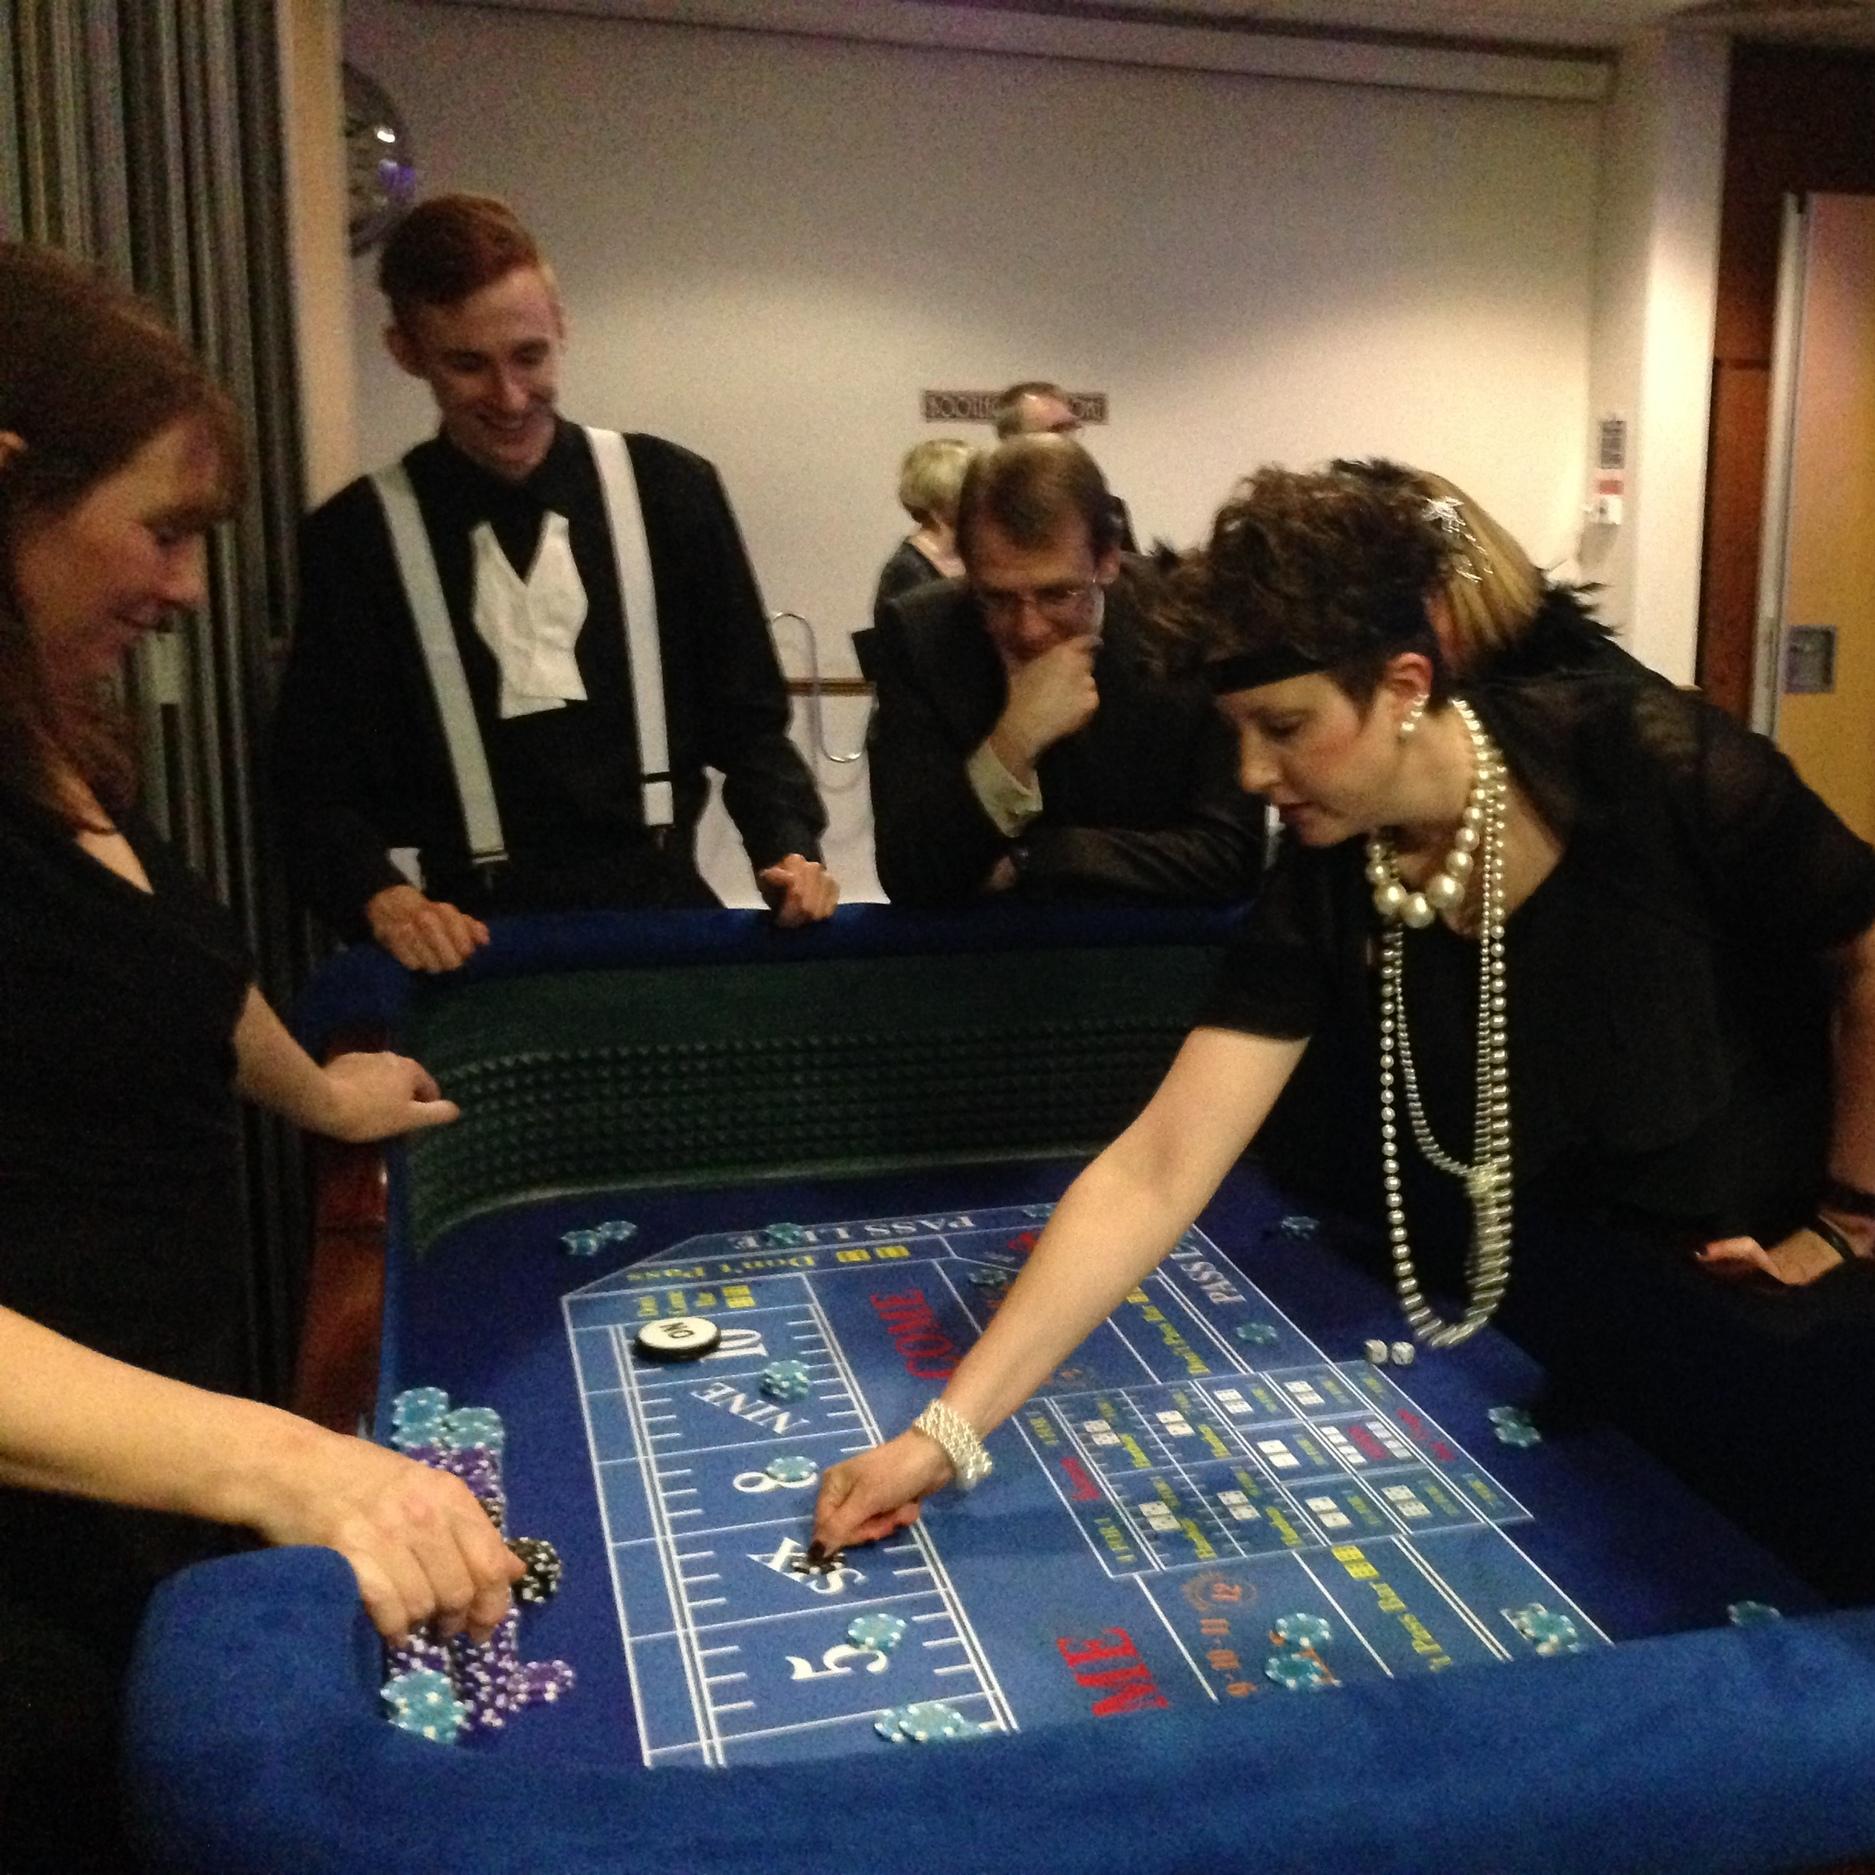 red_and_black_casinos_craps-dice_parties